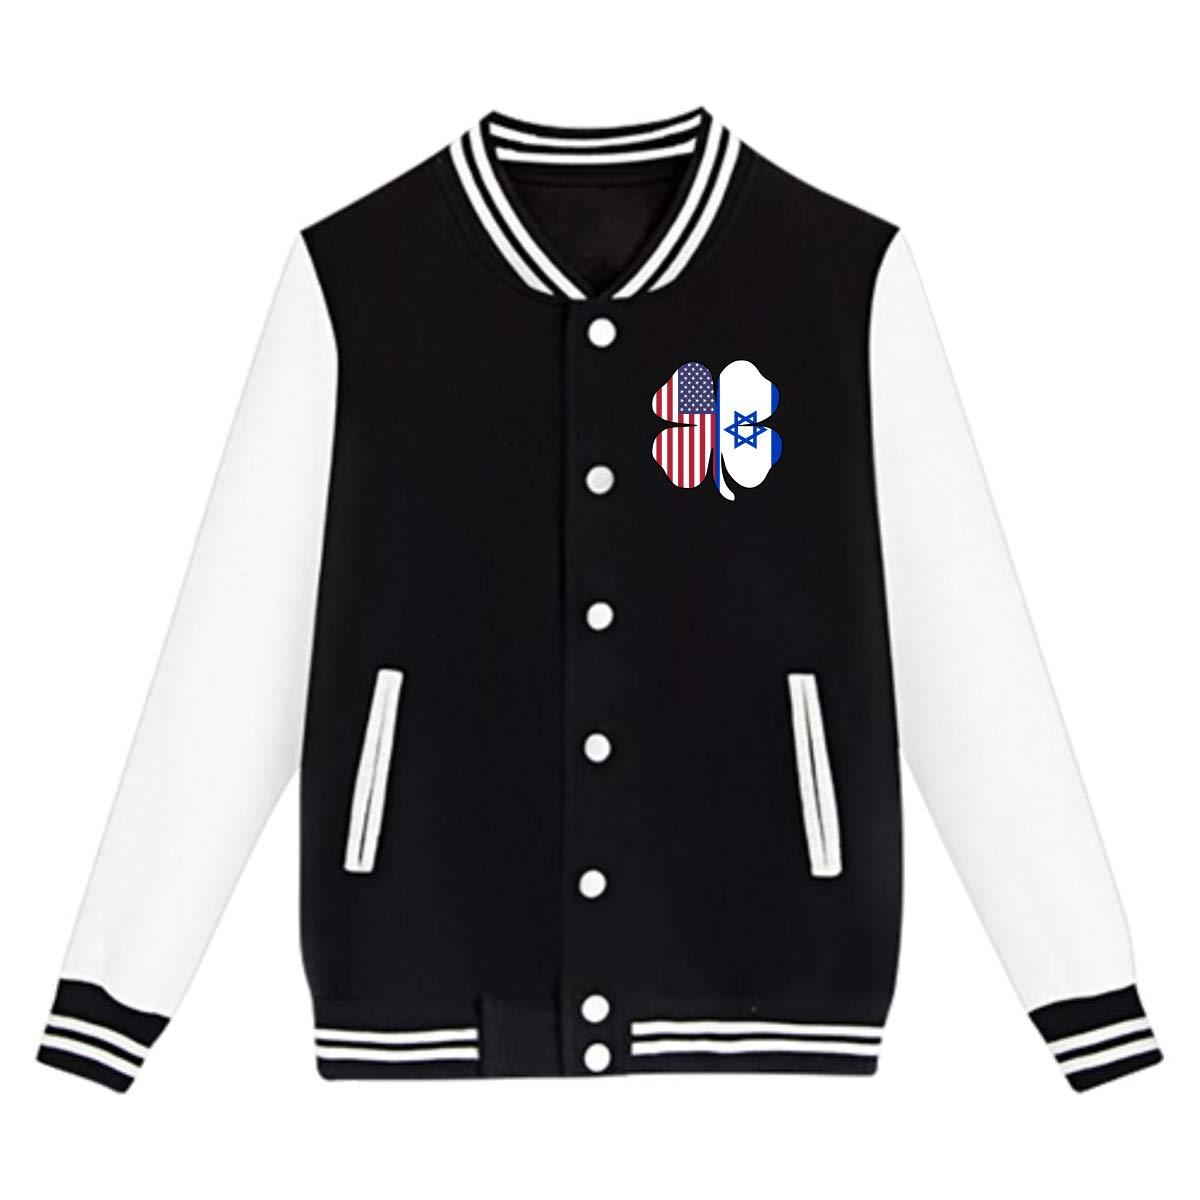 NJKM5MJ Unisex Youth Baseball Uniform Jacket American Israel Flag Shamrock Hoodie Coat Sweater Sweatshirt